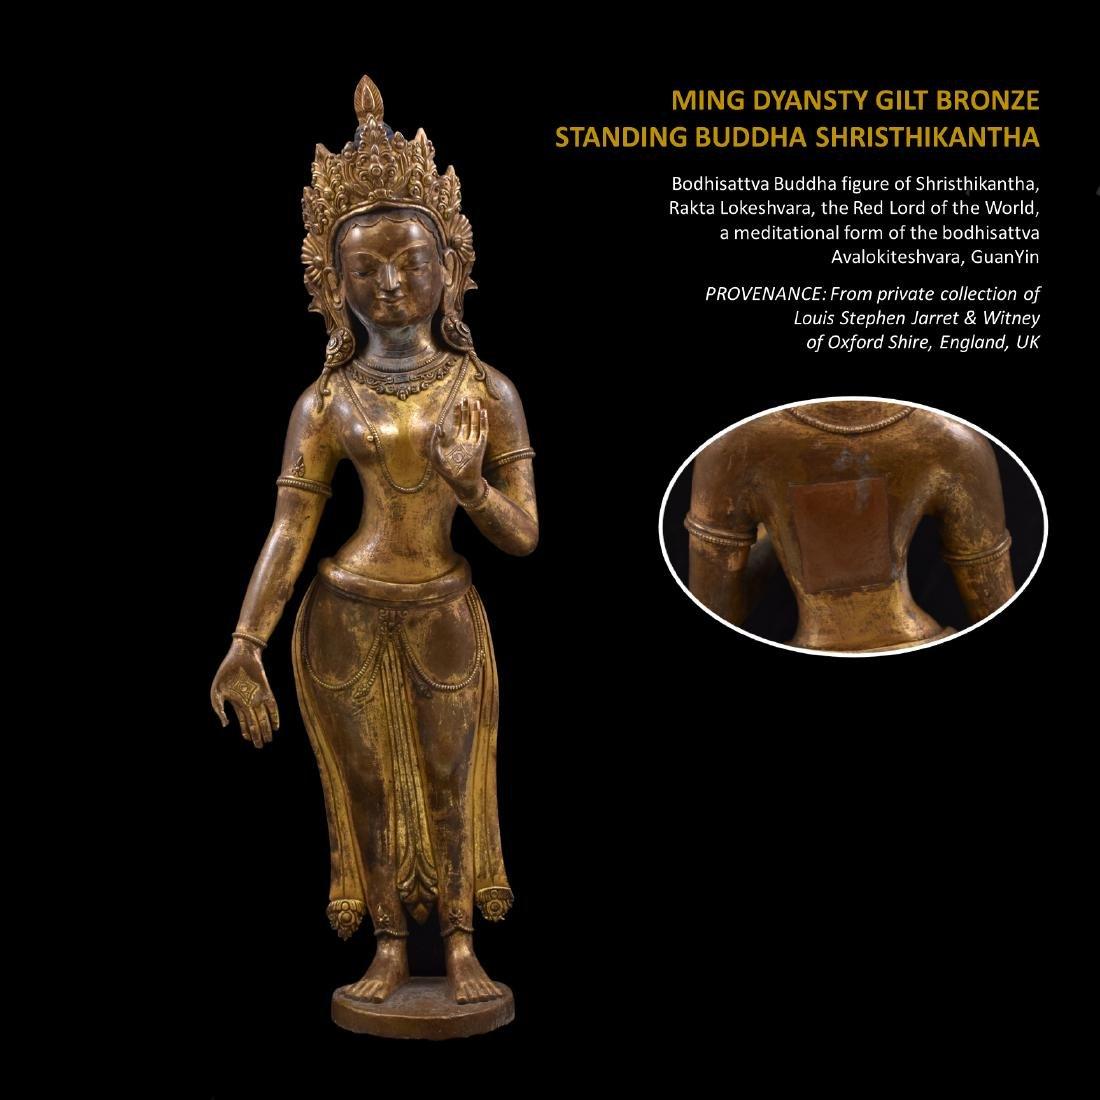 MING GILT BRONZE STANDING BUDDHA SHRISTHIKANTHA